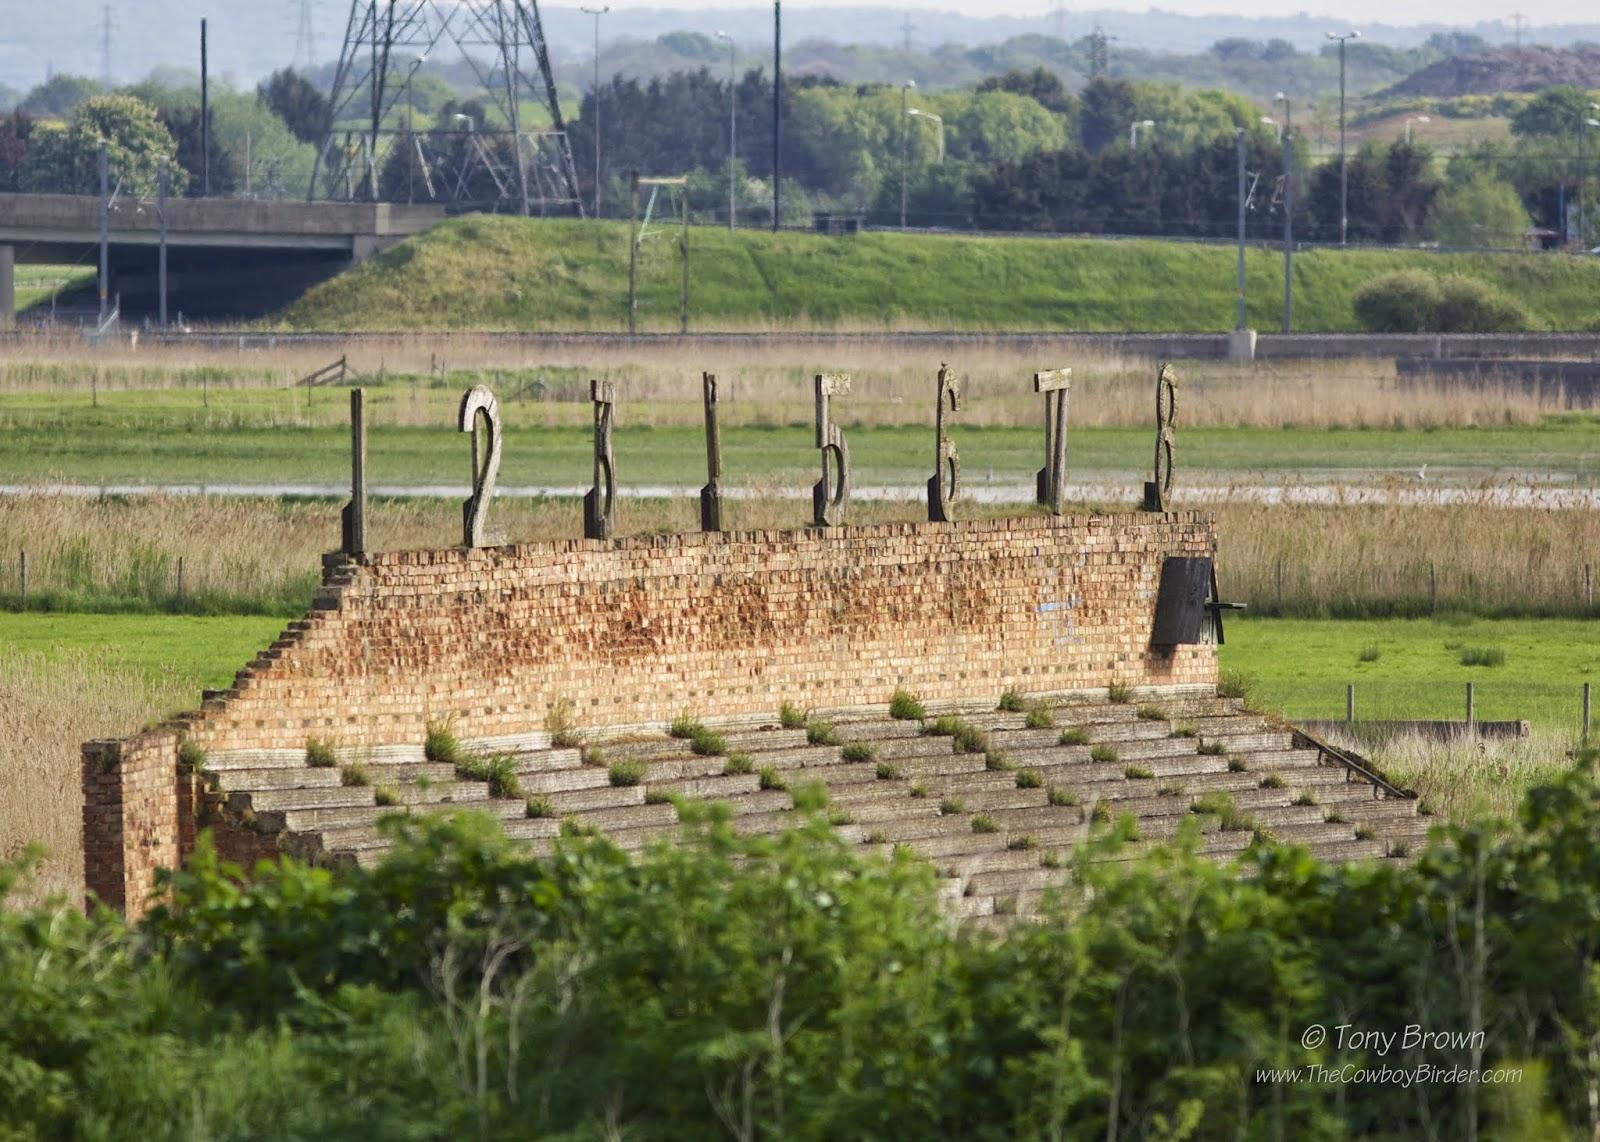 RSPB, Targets, Marsh